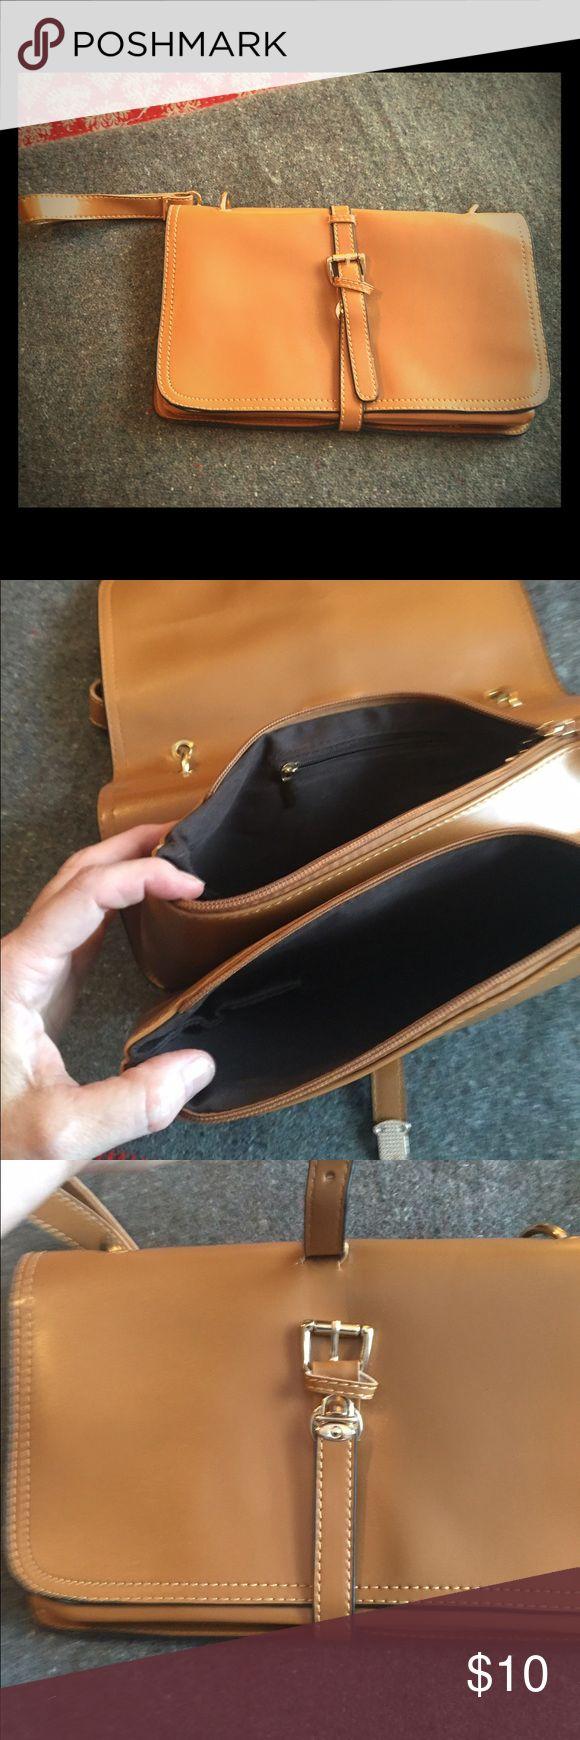 Cute faux  leather camel clutch purse nwot Cute faux  leather camel clutch purse nwot  smoke free home very cute!!! Bags Clutches & Wristlets